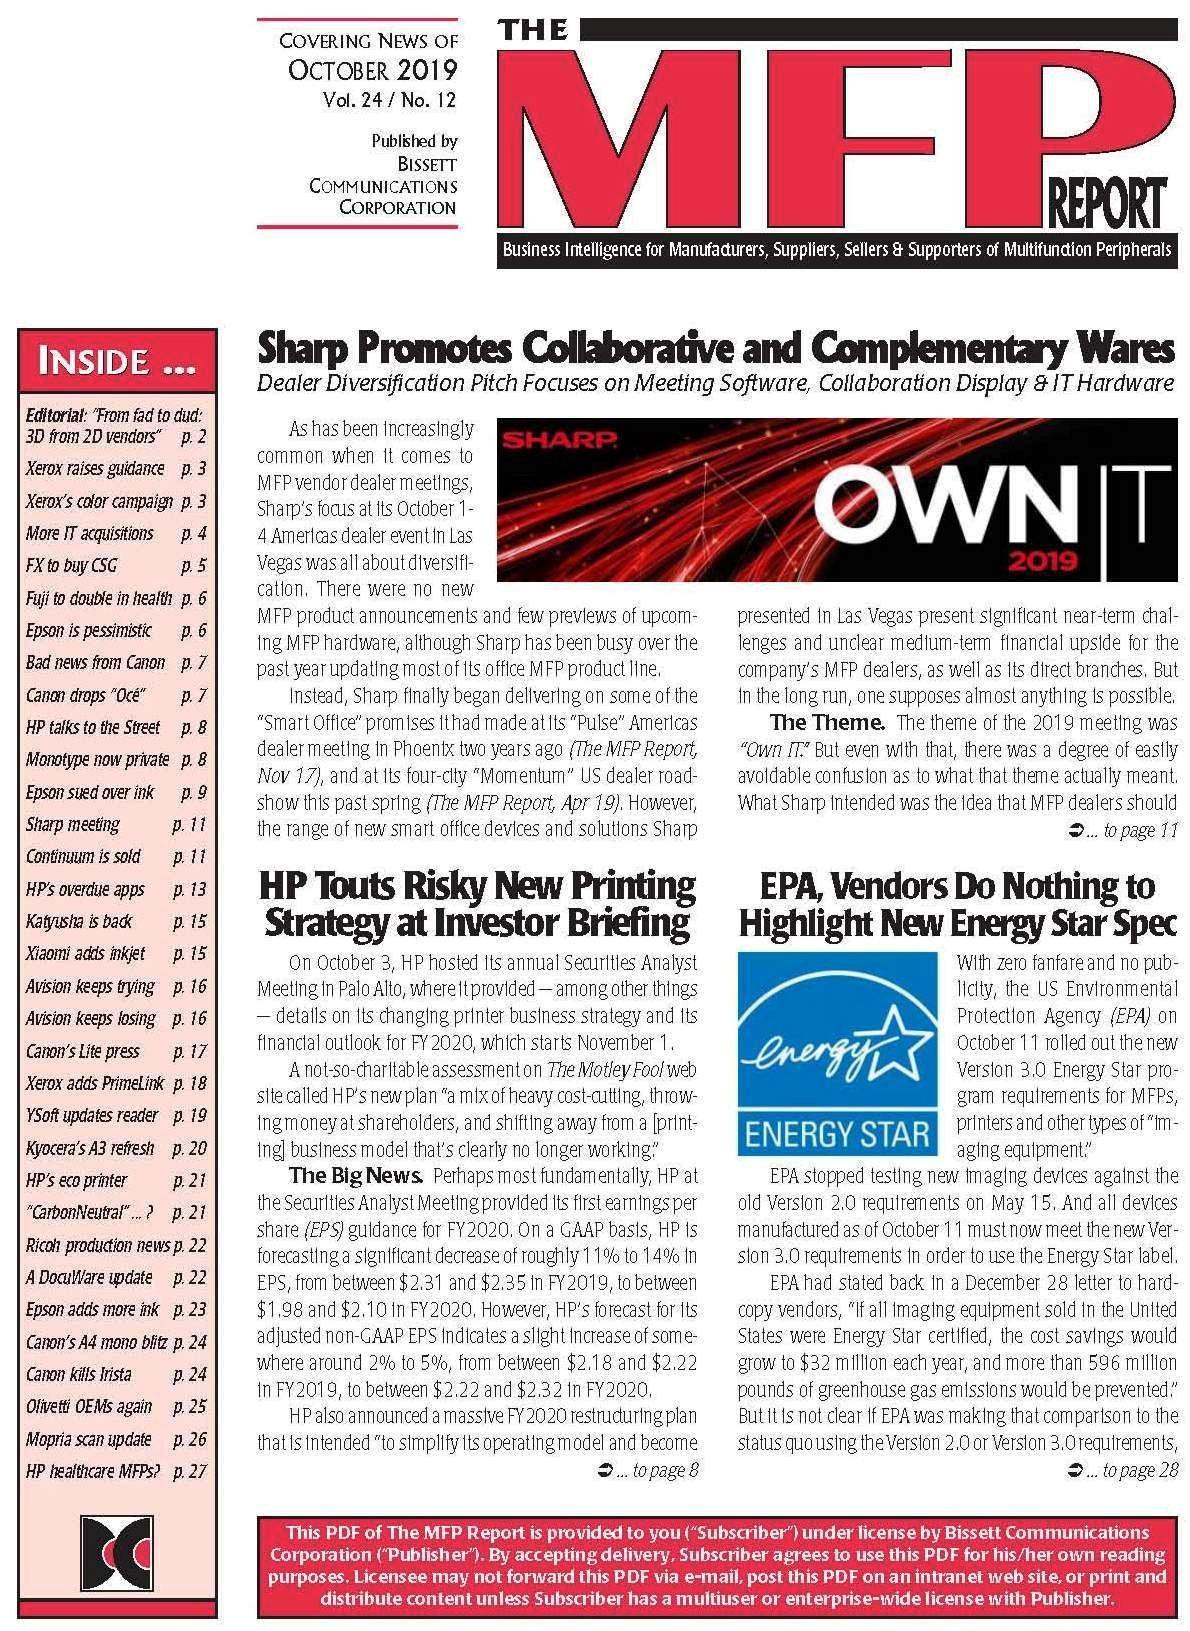 The MFP Report - September 2019 - Cover